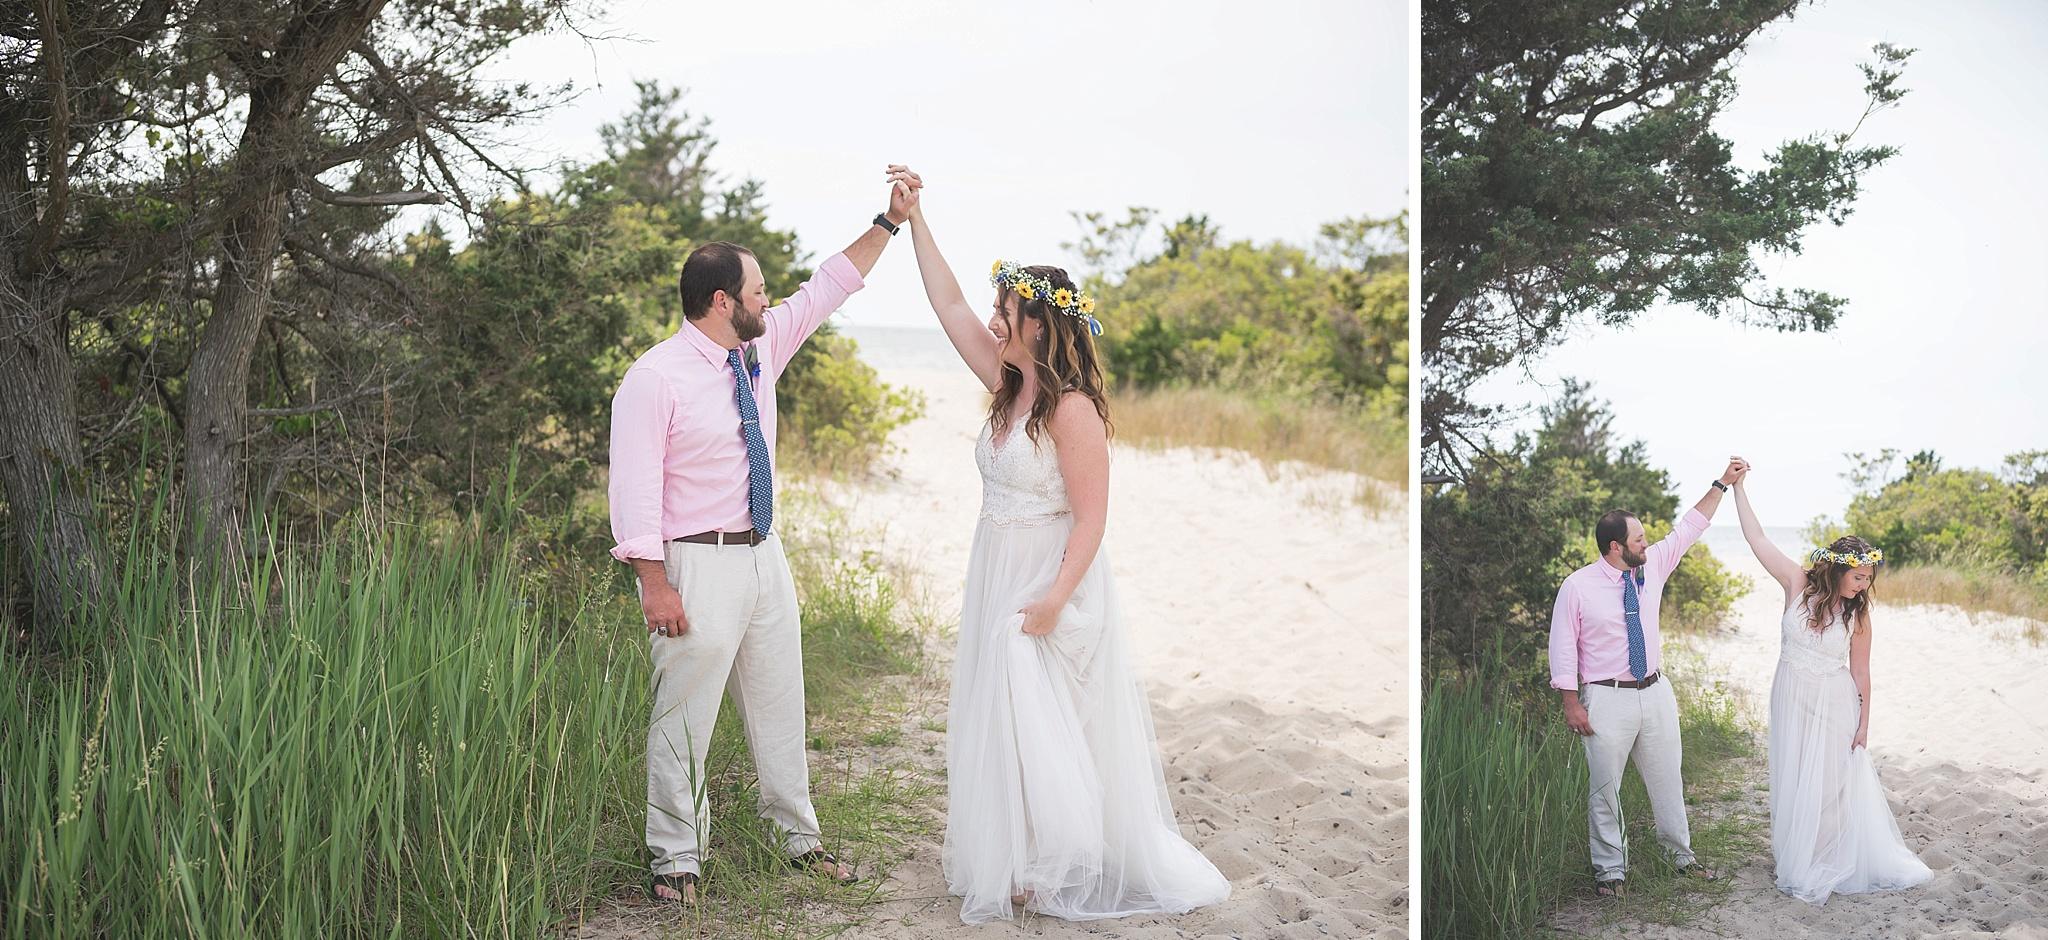 Avon-NC-Wedding-Photographer-189.jpg